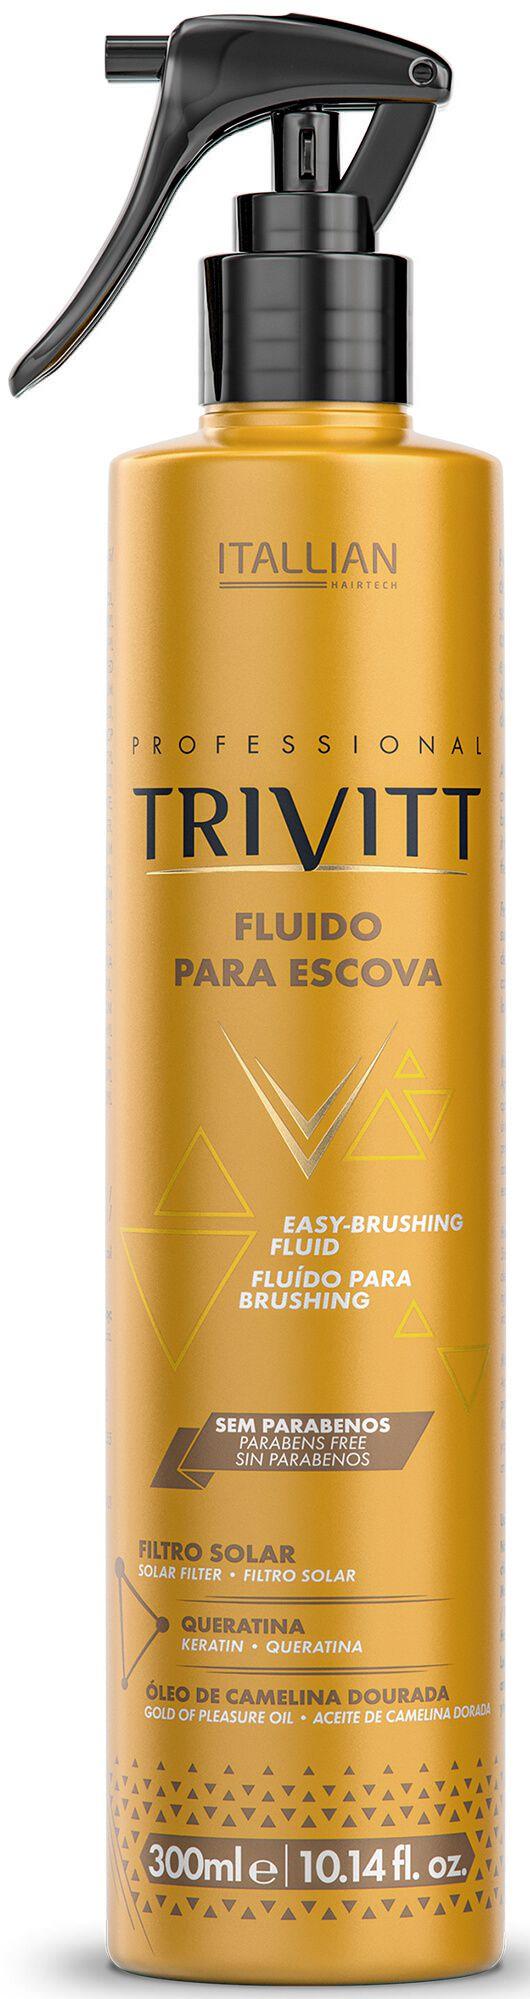 Progressiva Supreme Liss Let Me Be Control Prosalon +brindes